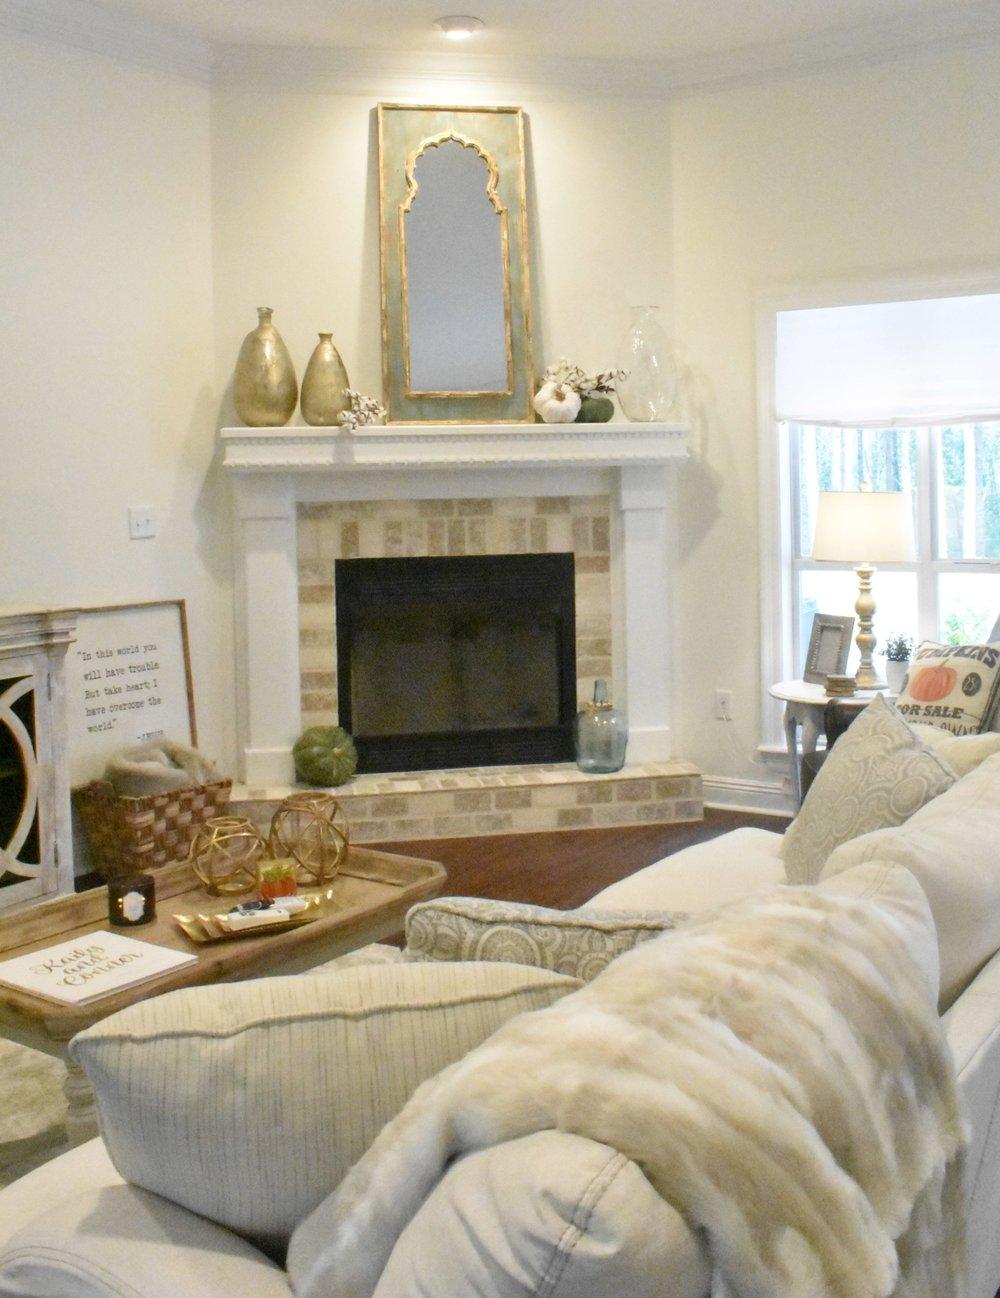 Fireplace City Home Center